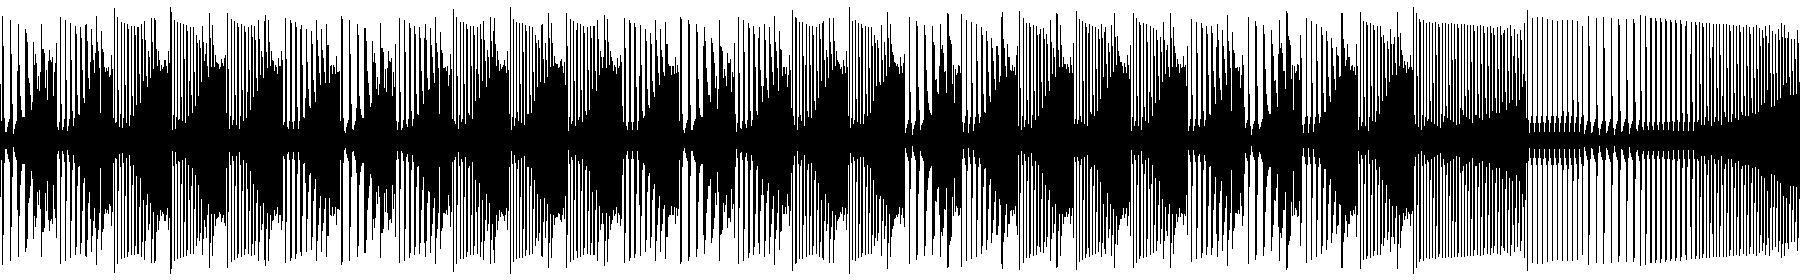 mc09 acid bassline10 130 cm